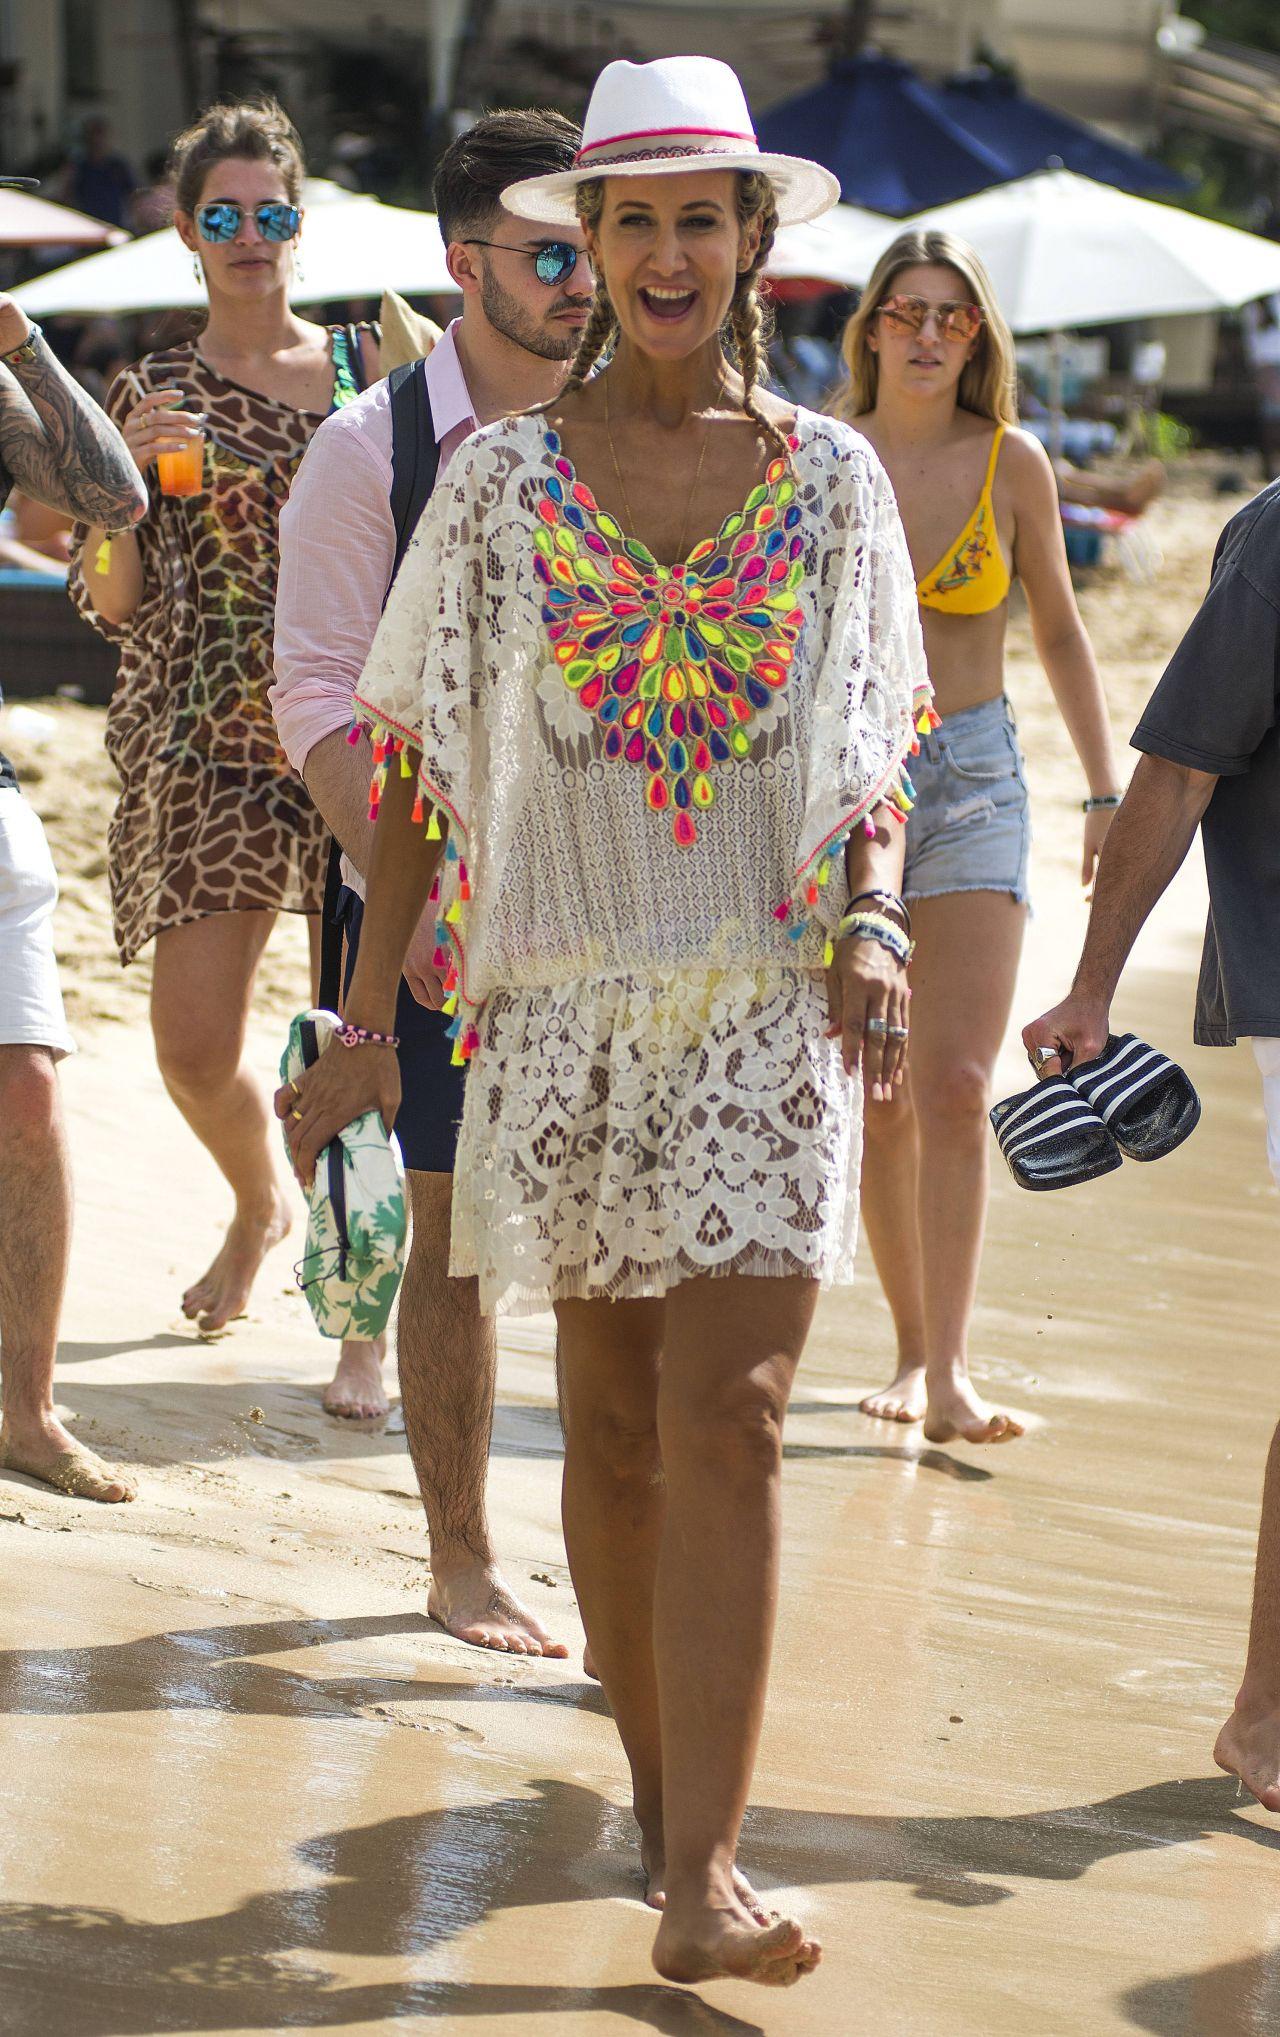 Lady Victoria Hervey in Bikini Boat Party in Barbados Pic 17 of 35